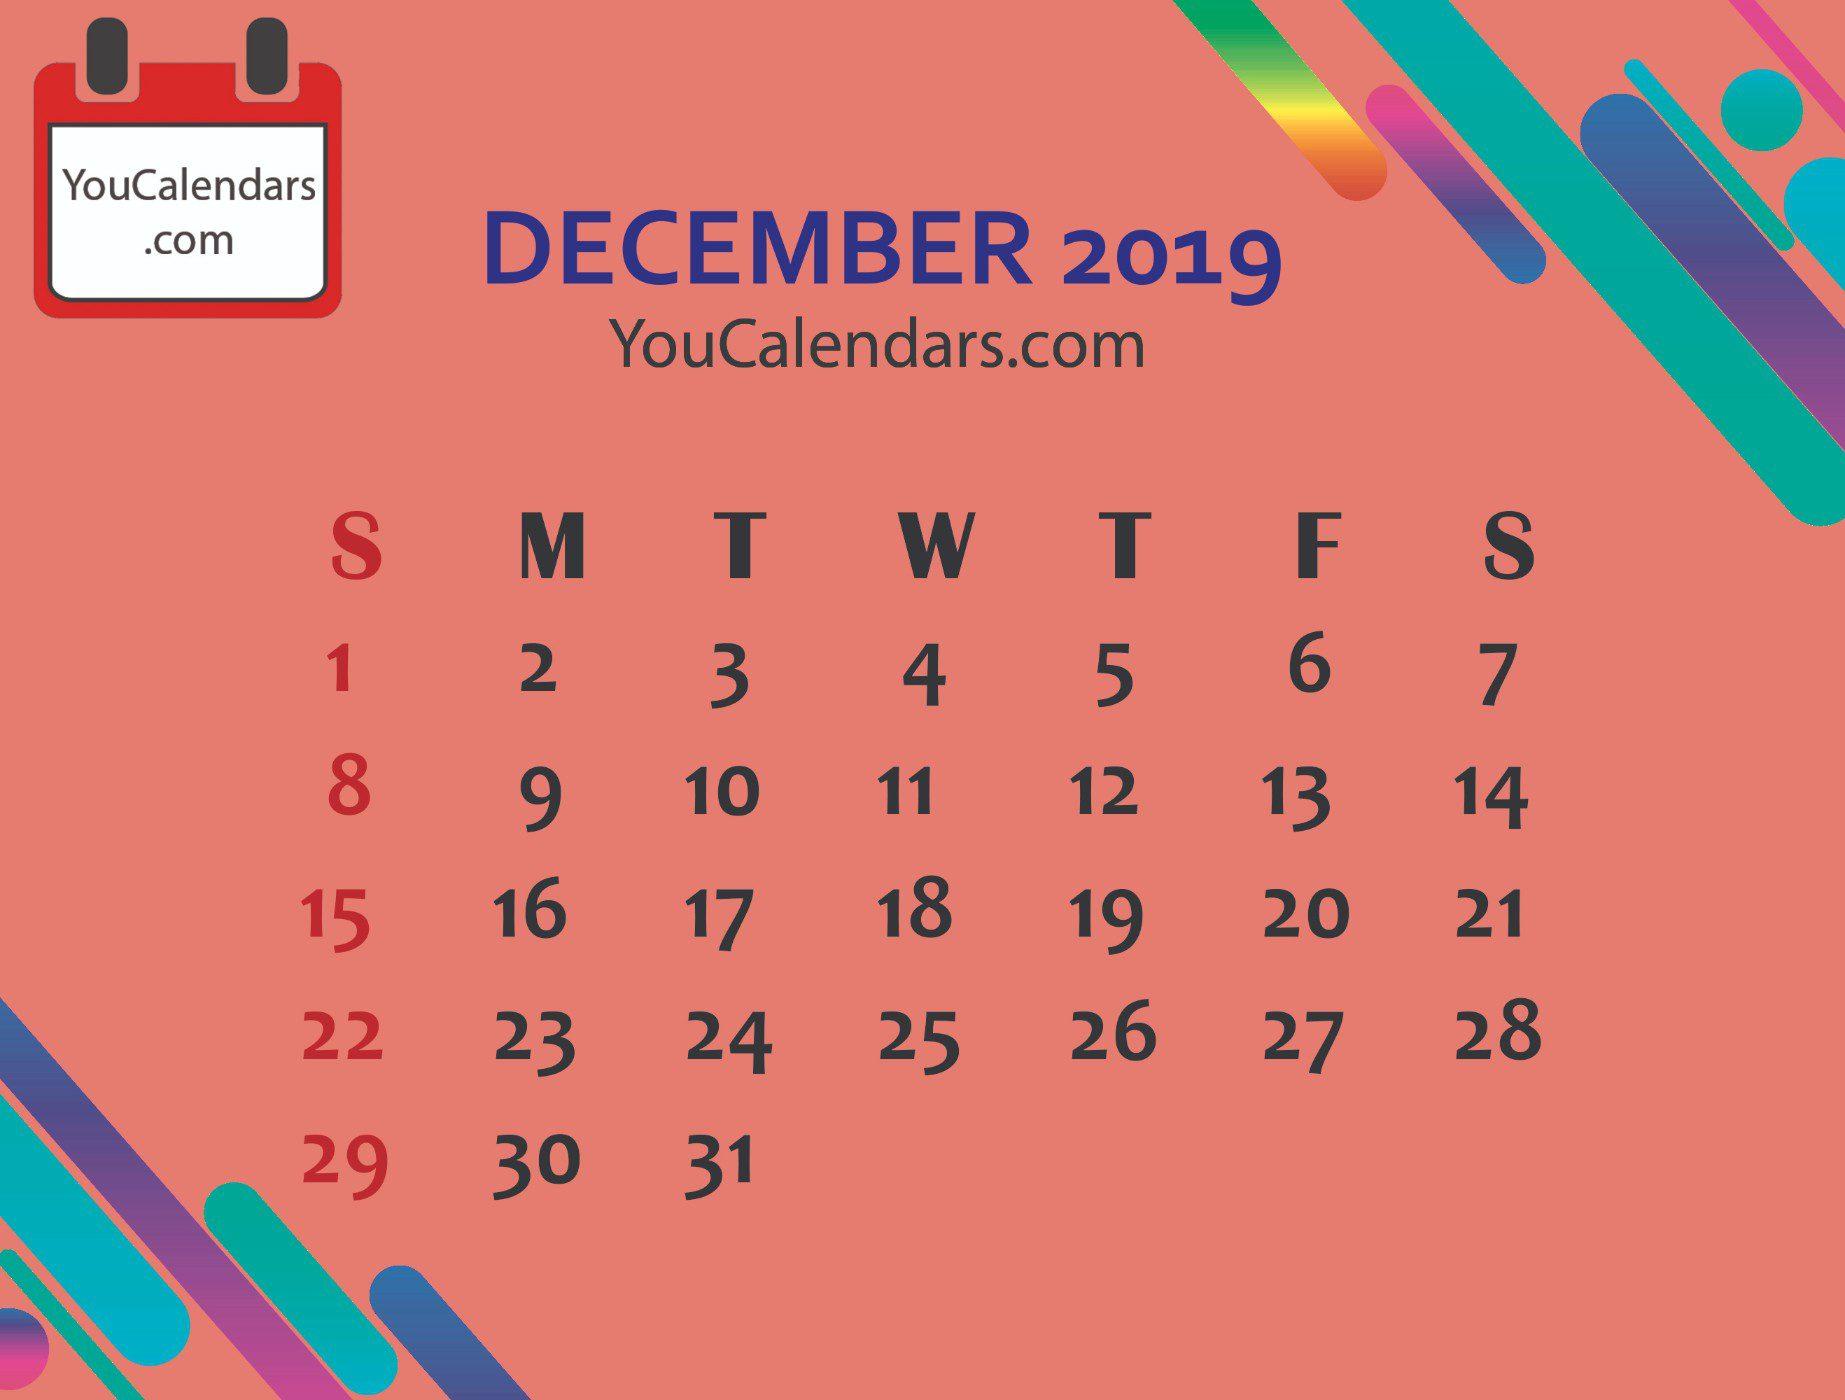 December 2019 Calendar Cute Designs